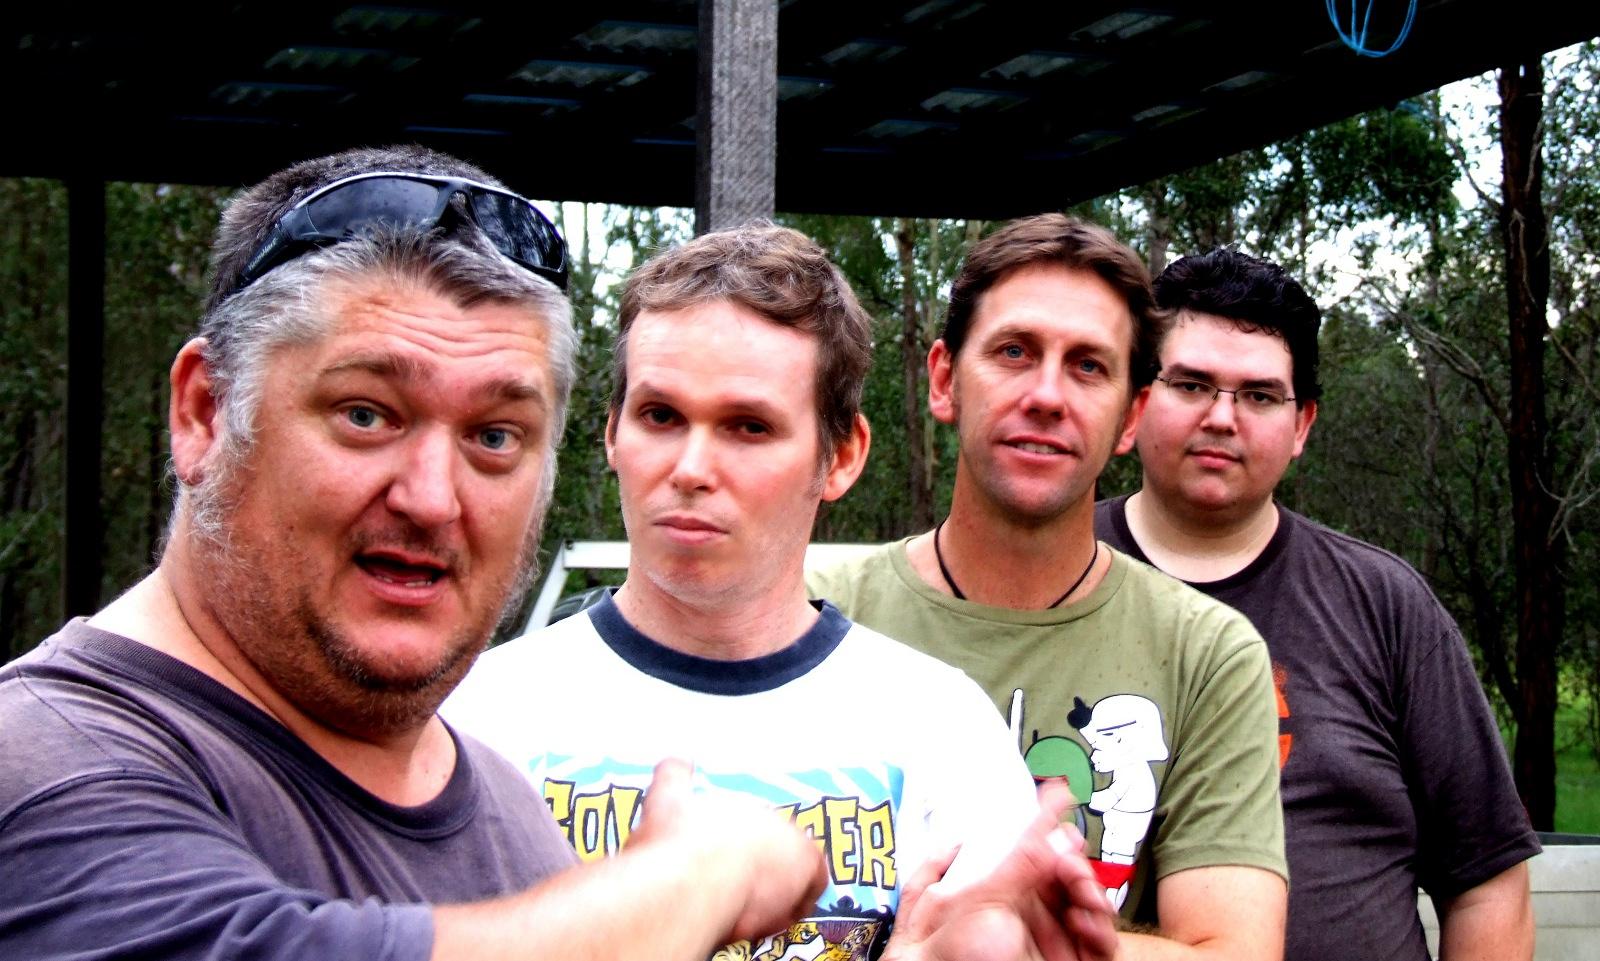 WEEZAL, 4 guys with a beer fridge